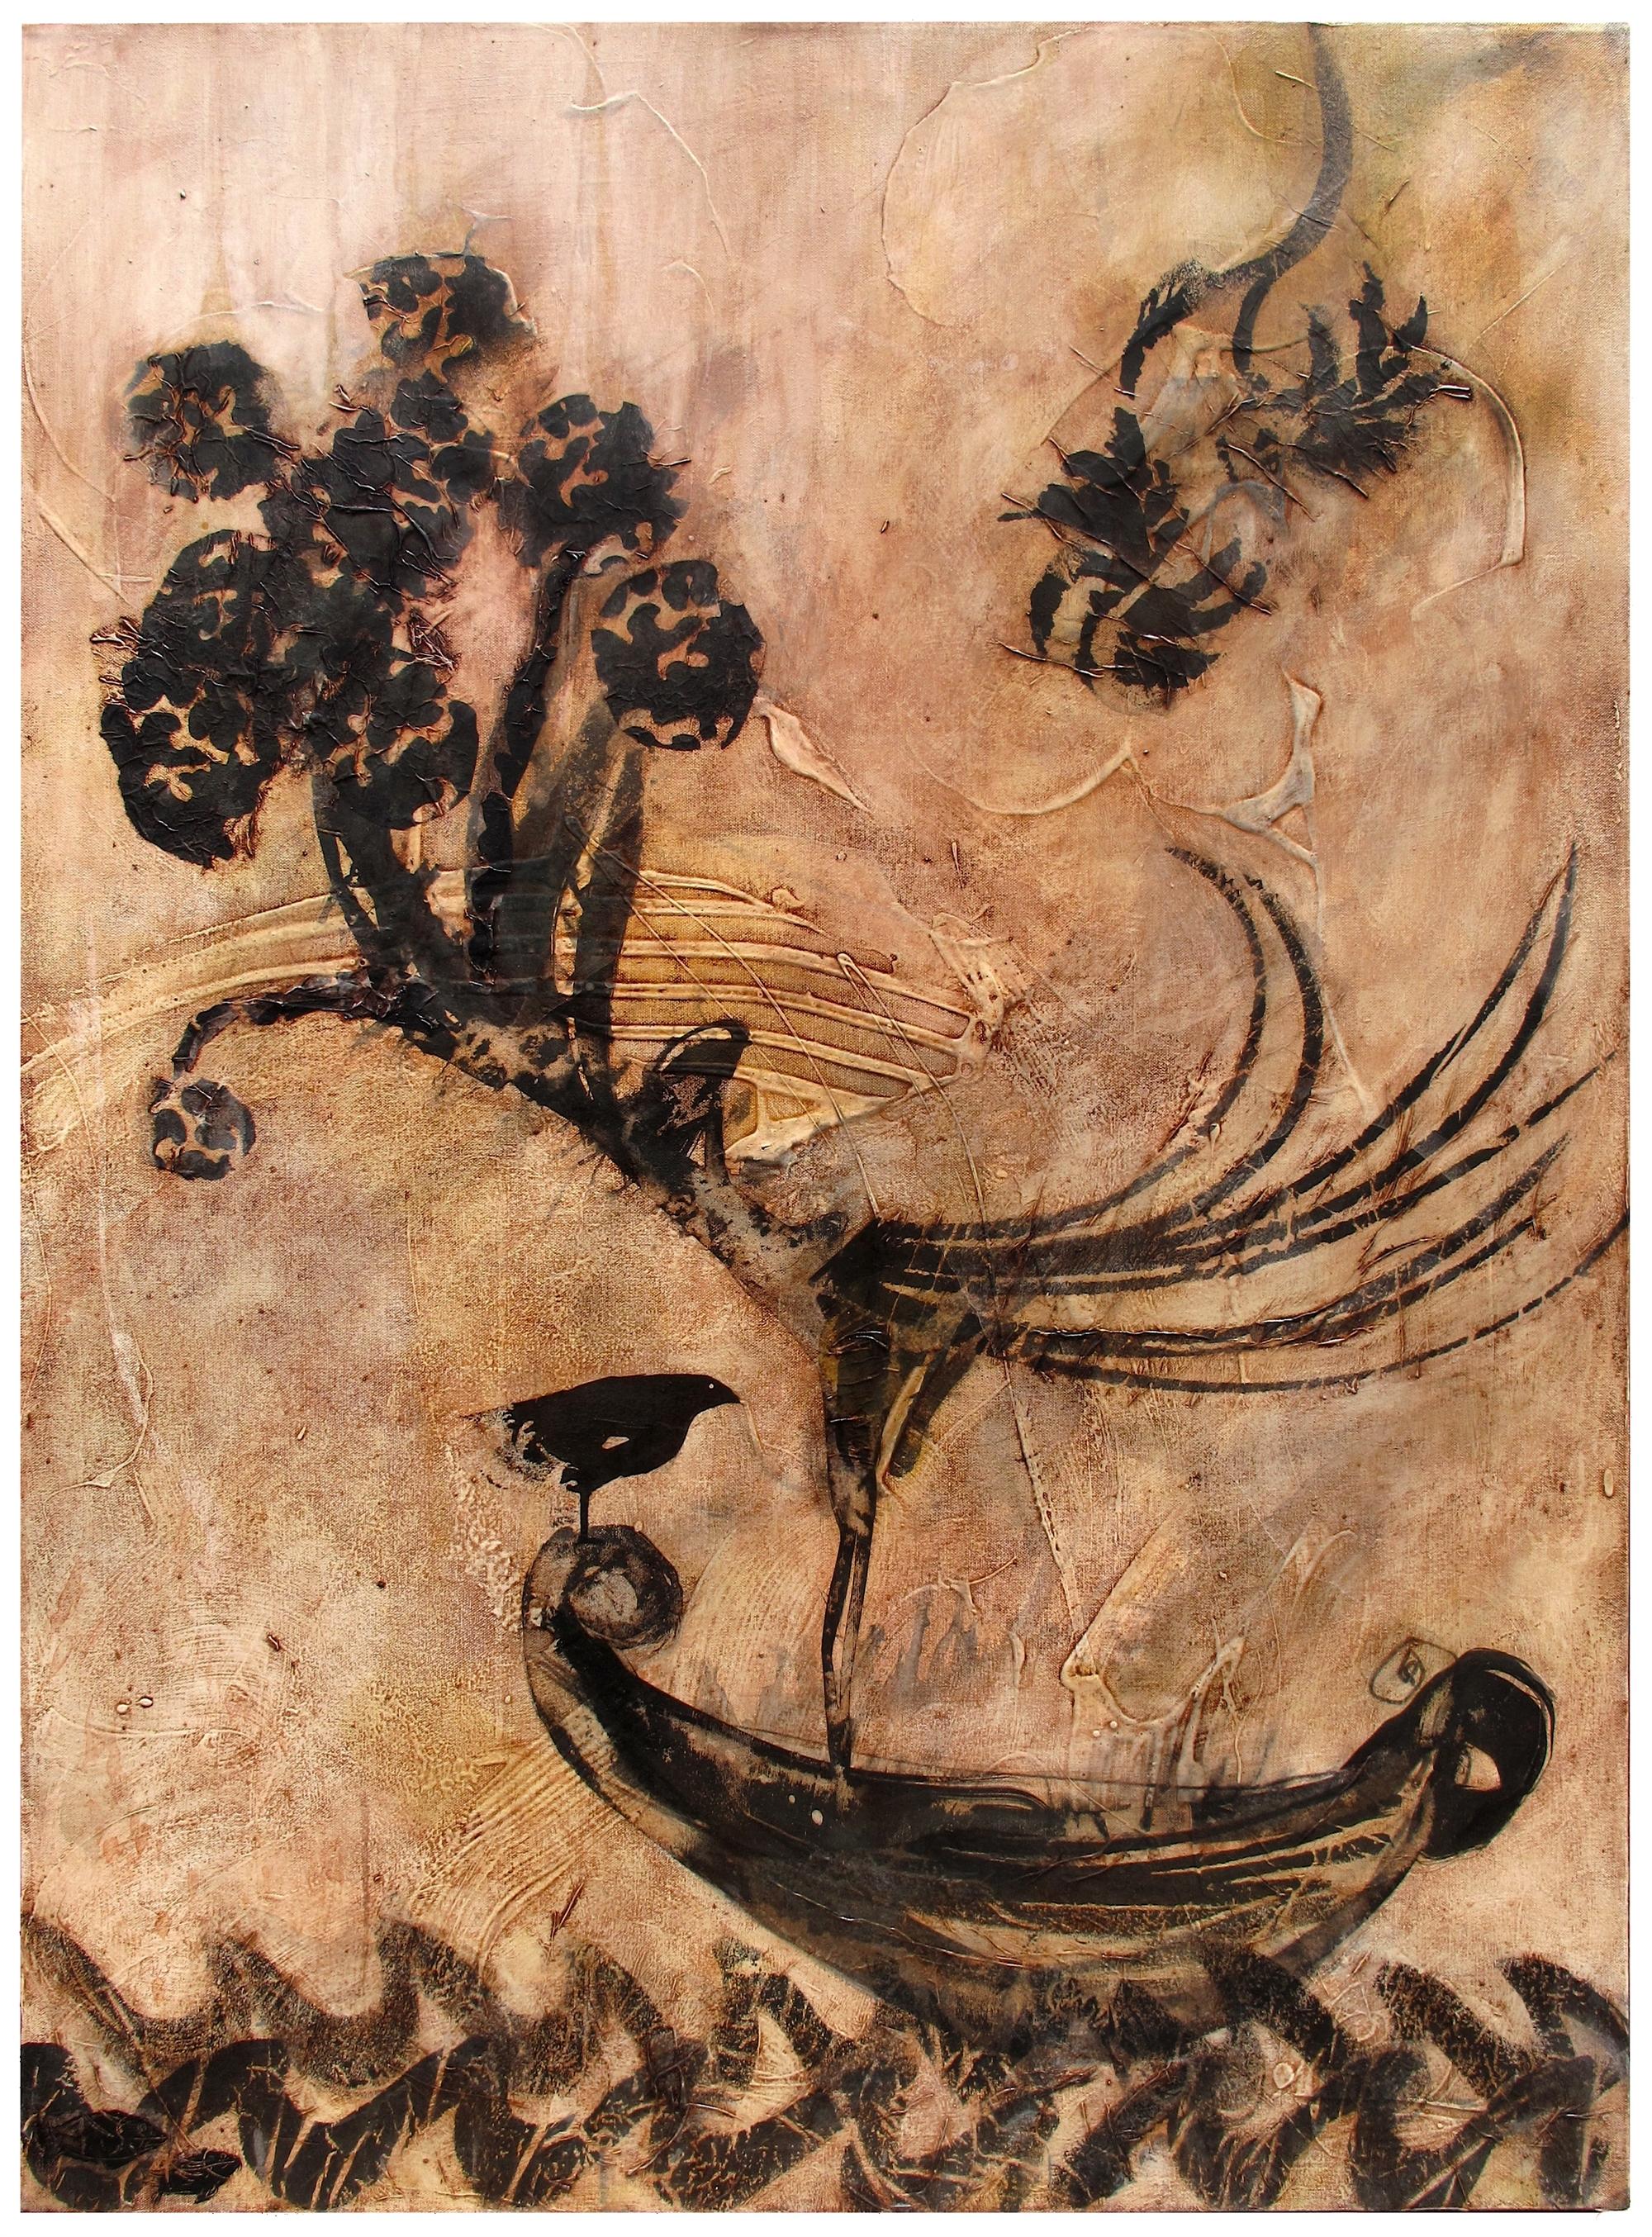 Aladdin's Lamp by Chrissy Dolan-Terrasi